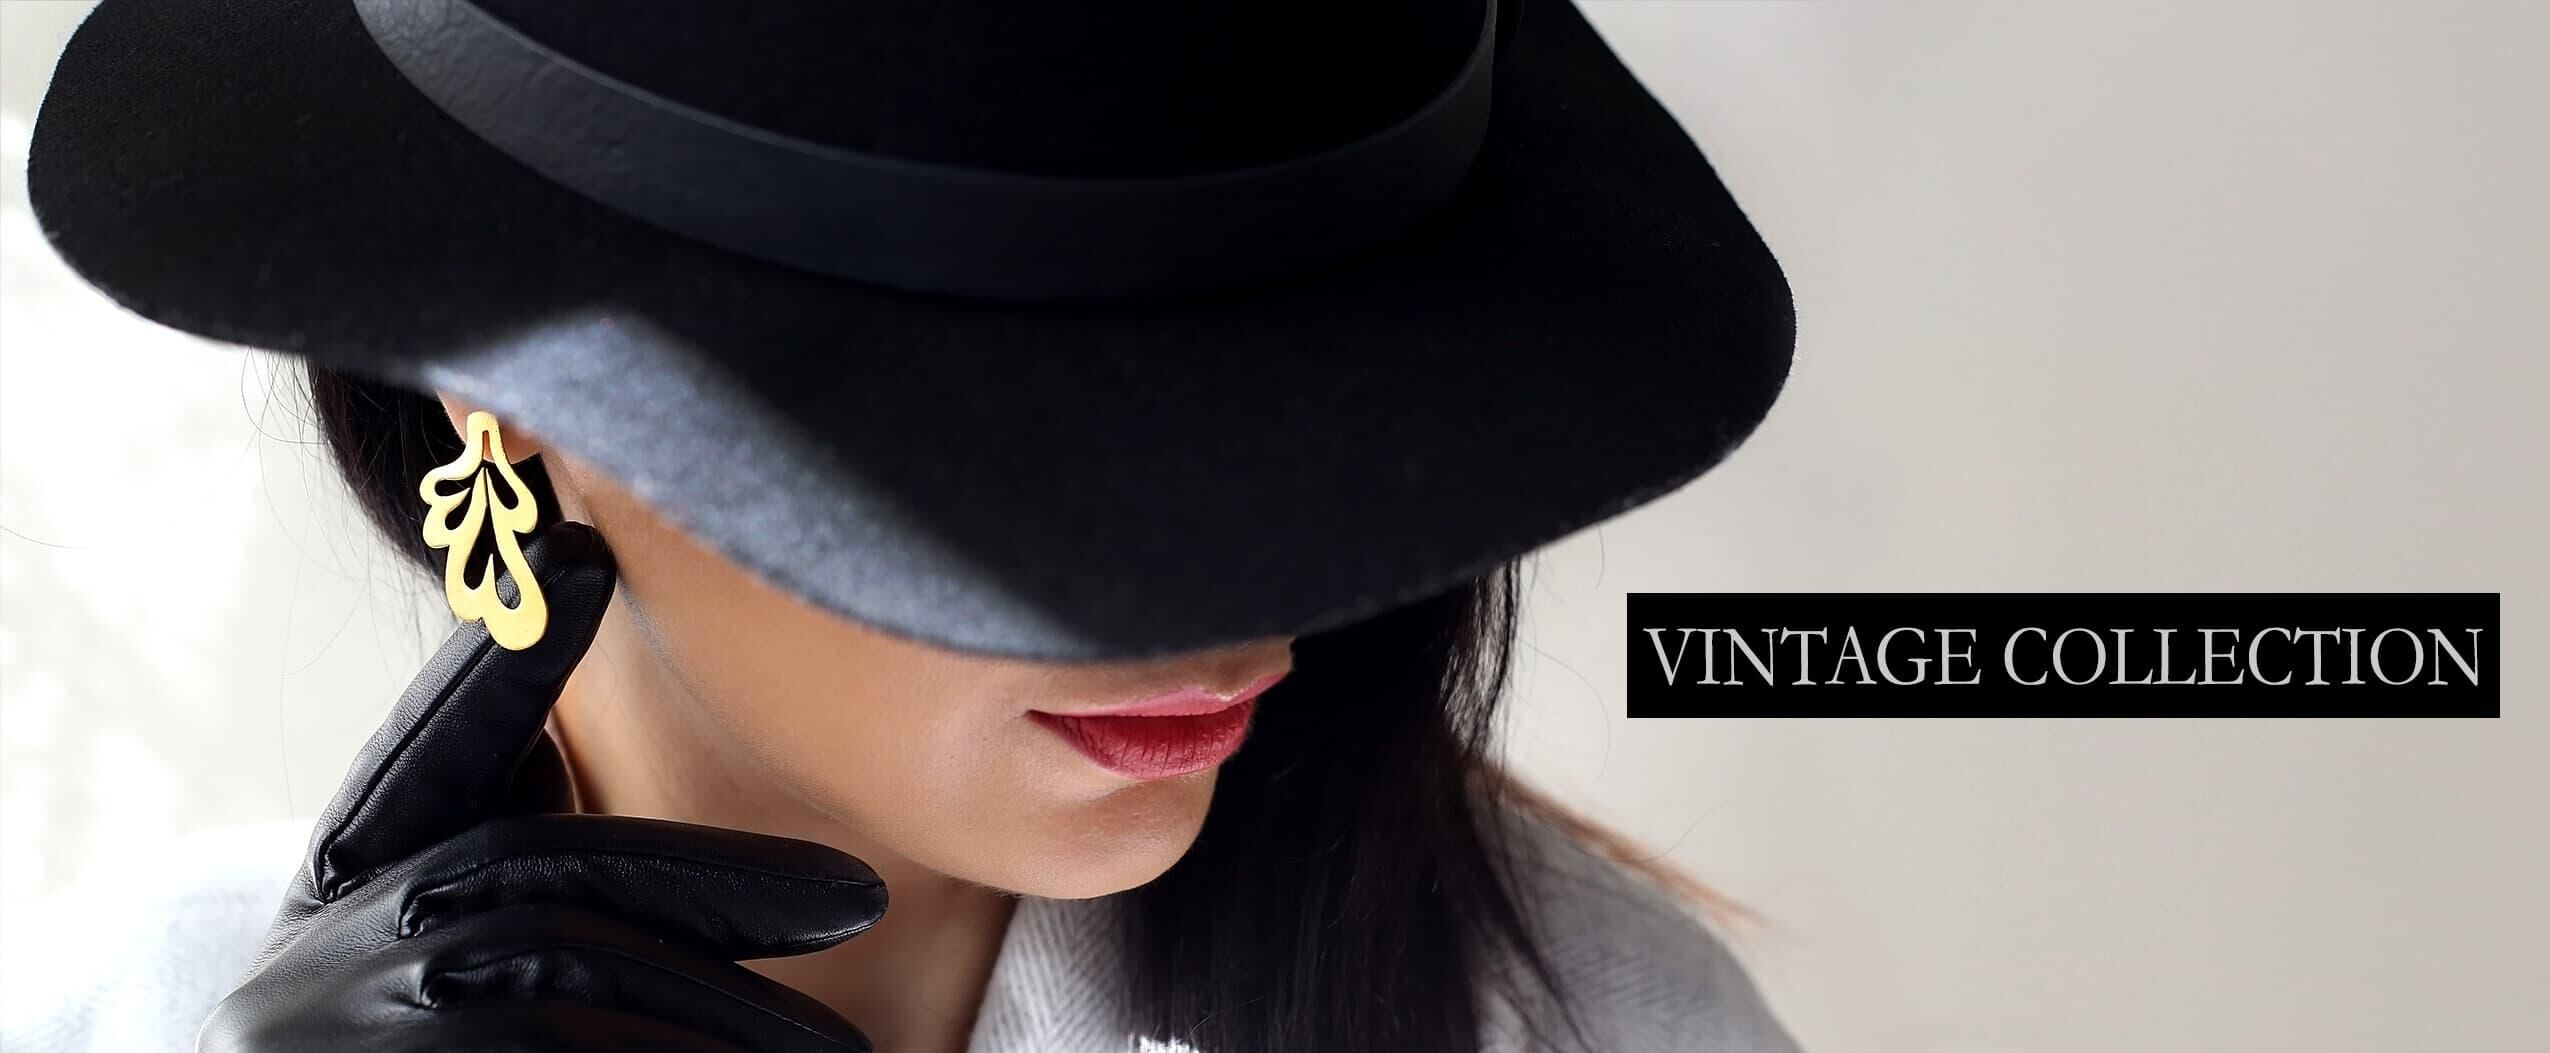 Vıntage Collection